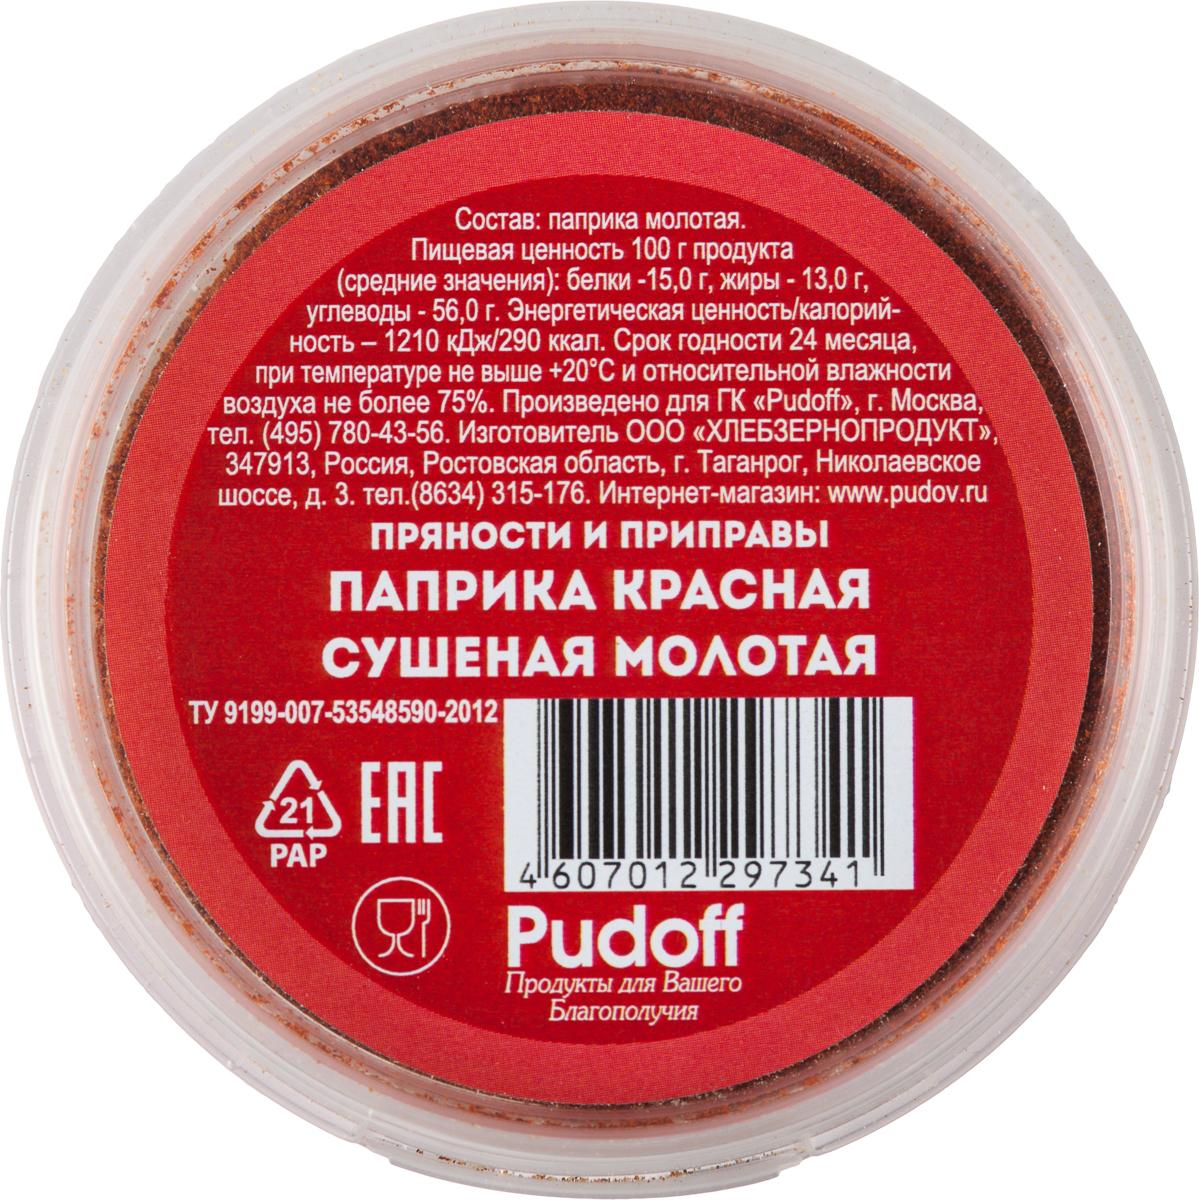 Пудовъ паприка красная сушеная молотая, 80 г